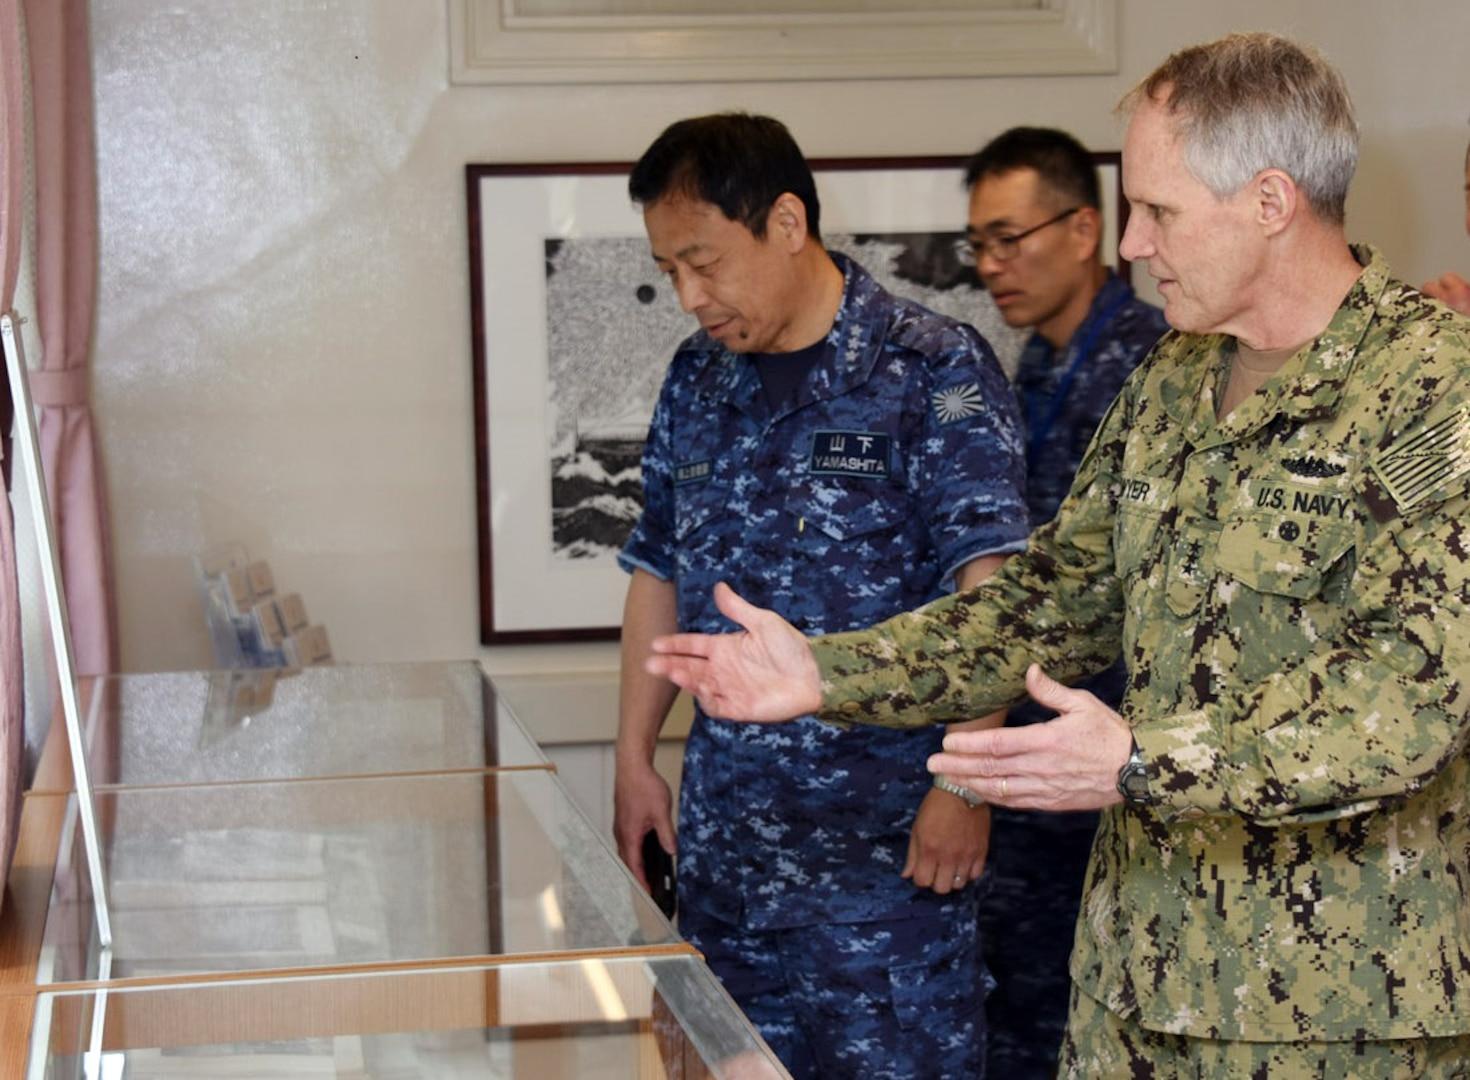 U.S. 7th Fleet Admiral Visits JMSDF Maizuru District Headquarters